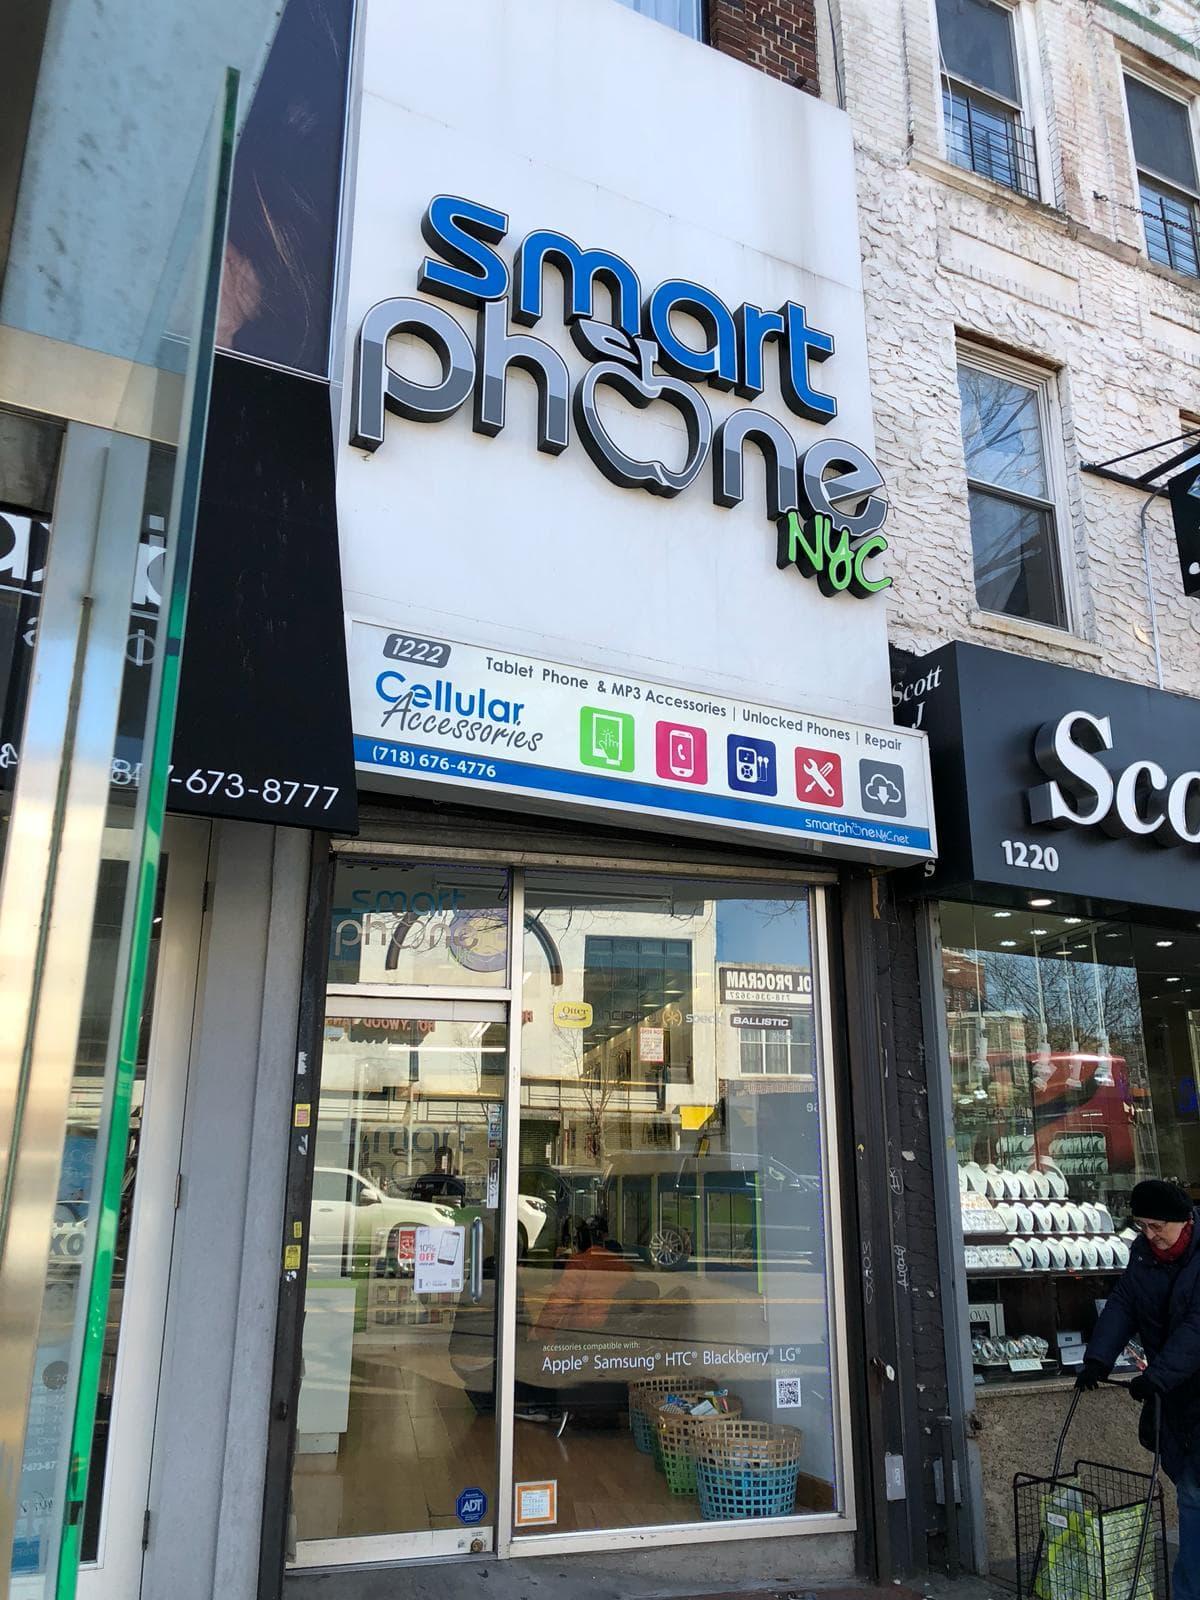 Smart Phone NYC Sheepshead Bay Location